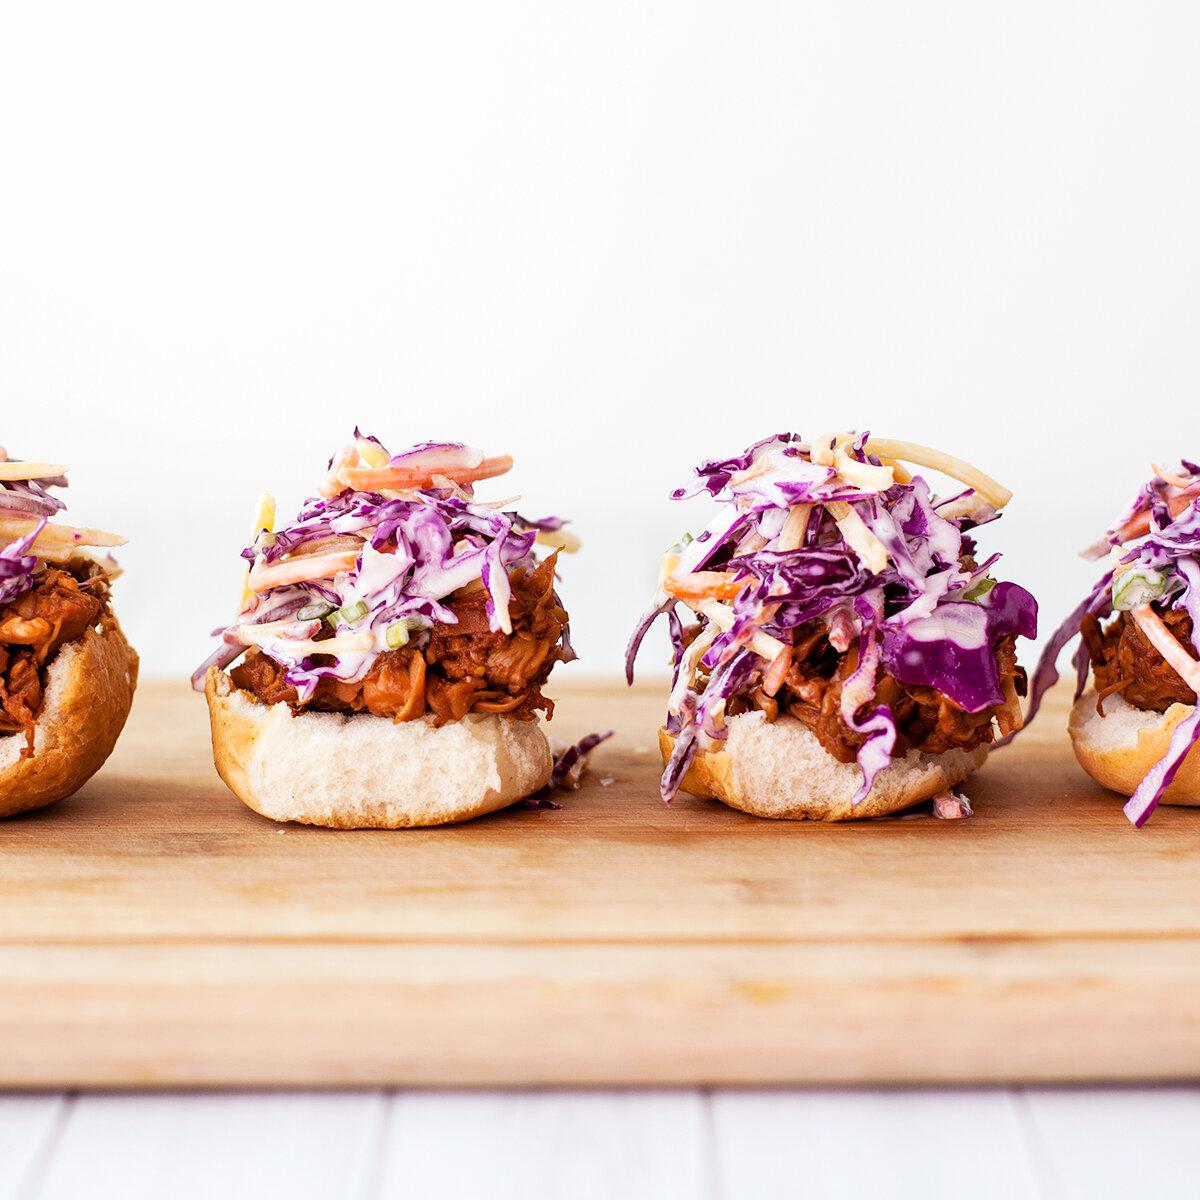 BBQ Jackfruit Sliders. Yes, Please!